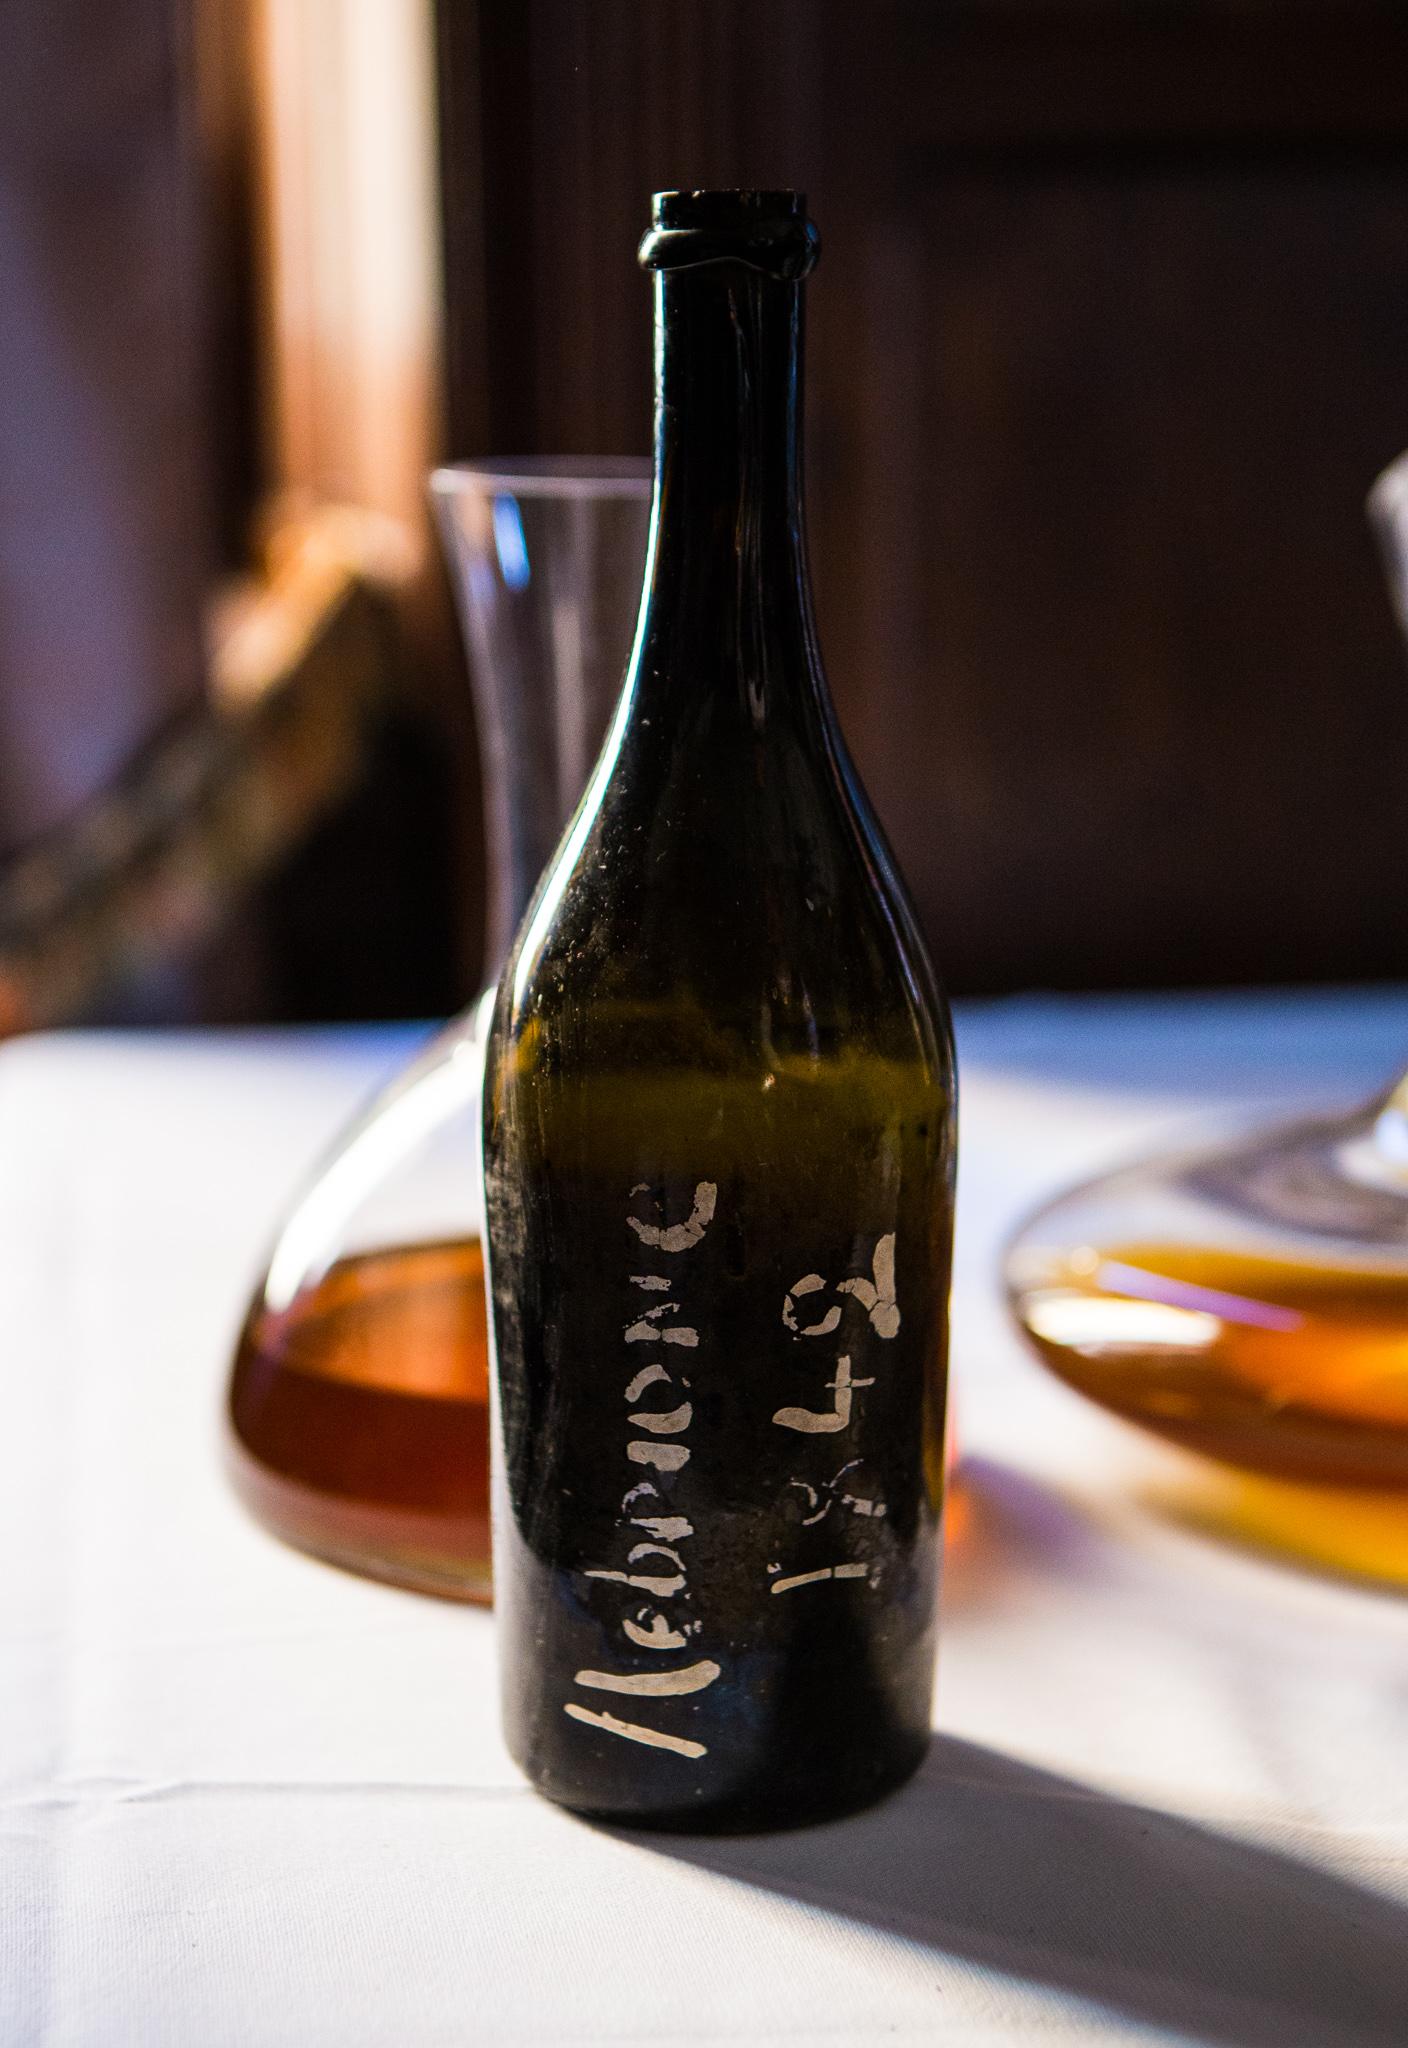 Den eldste flasken, fra 1842.